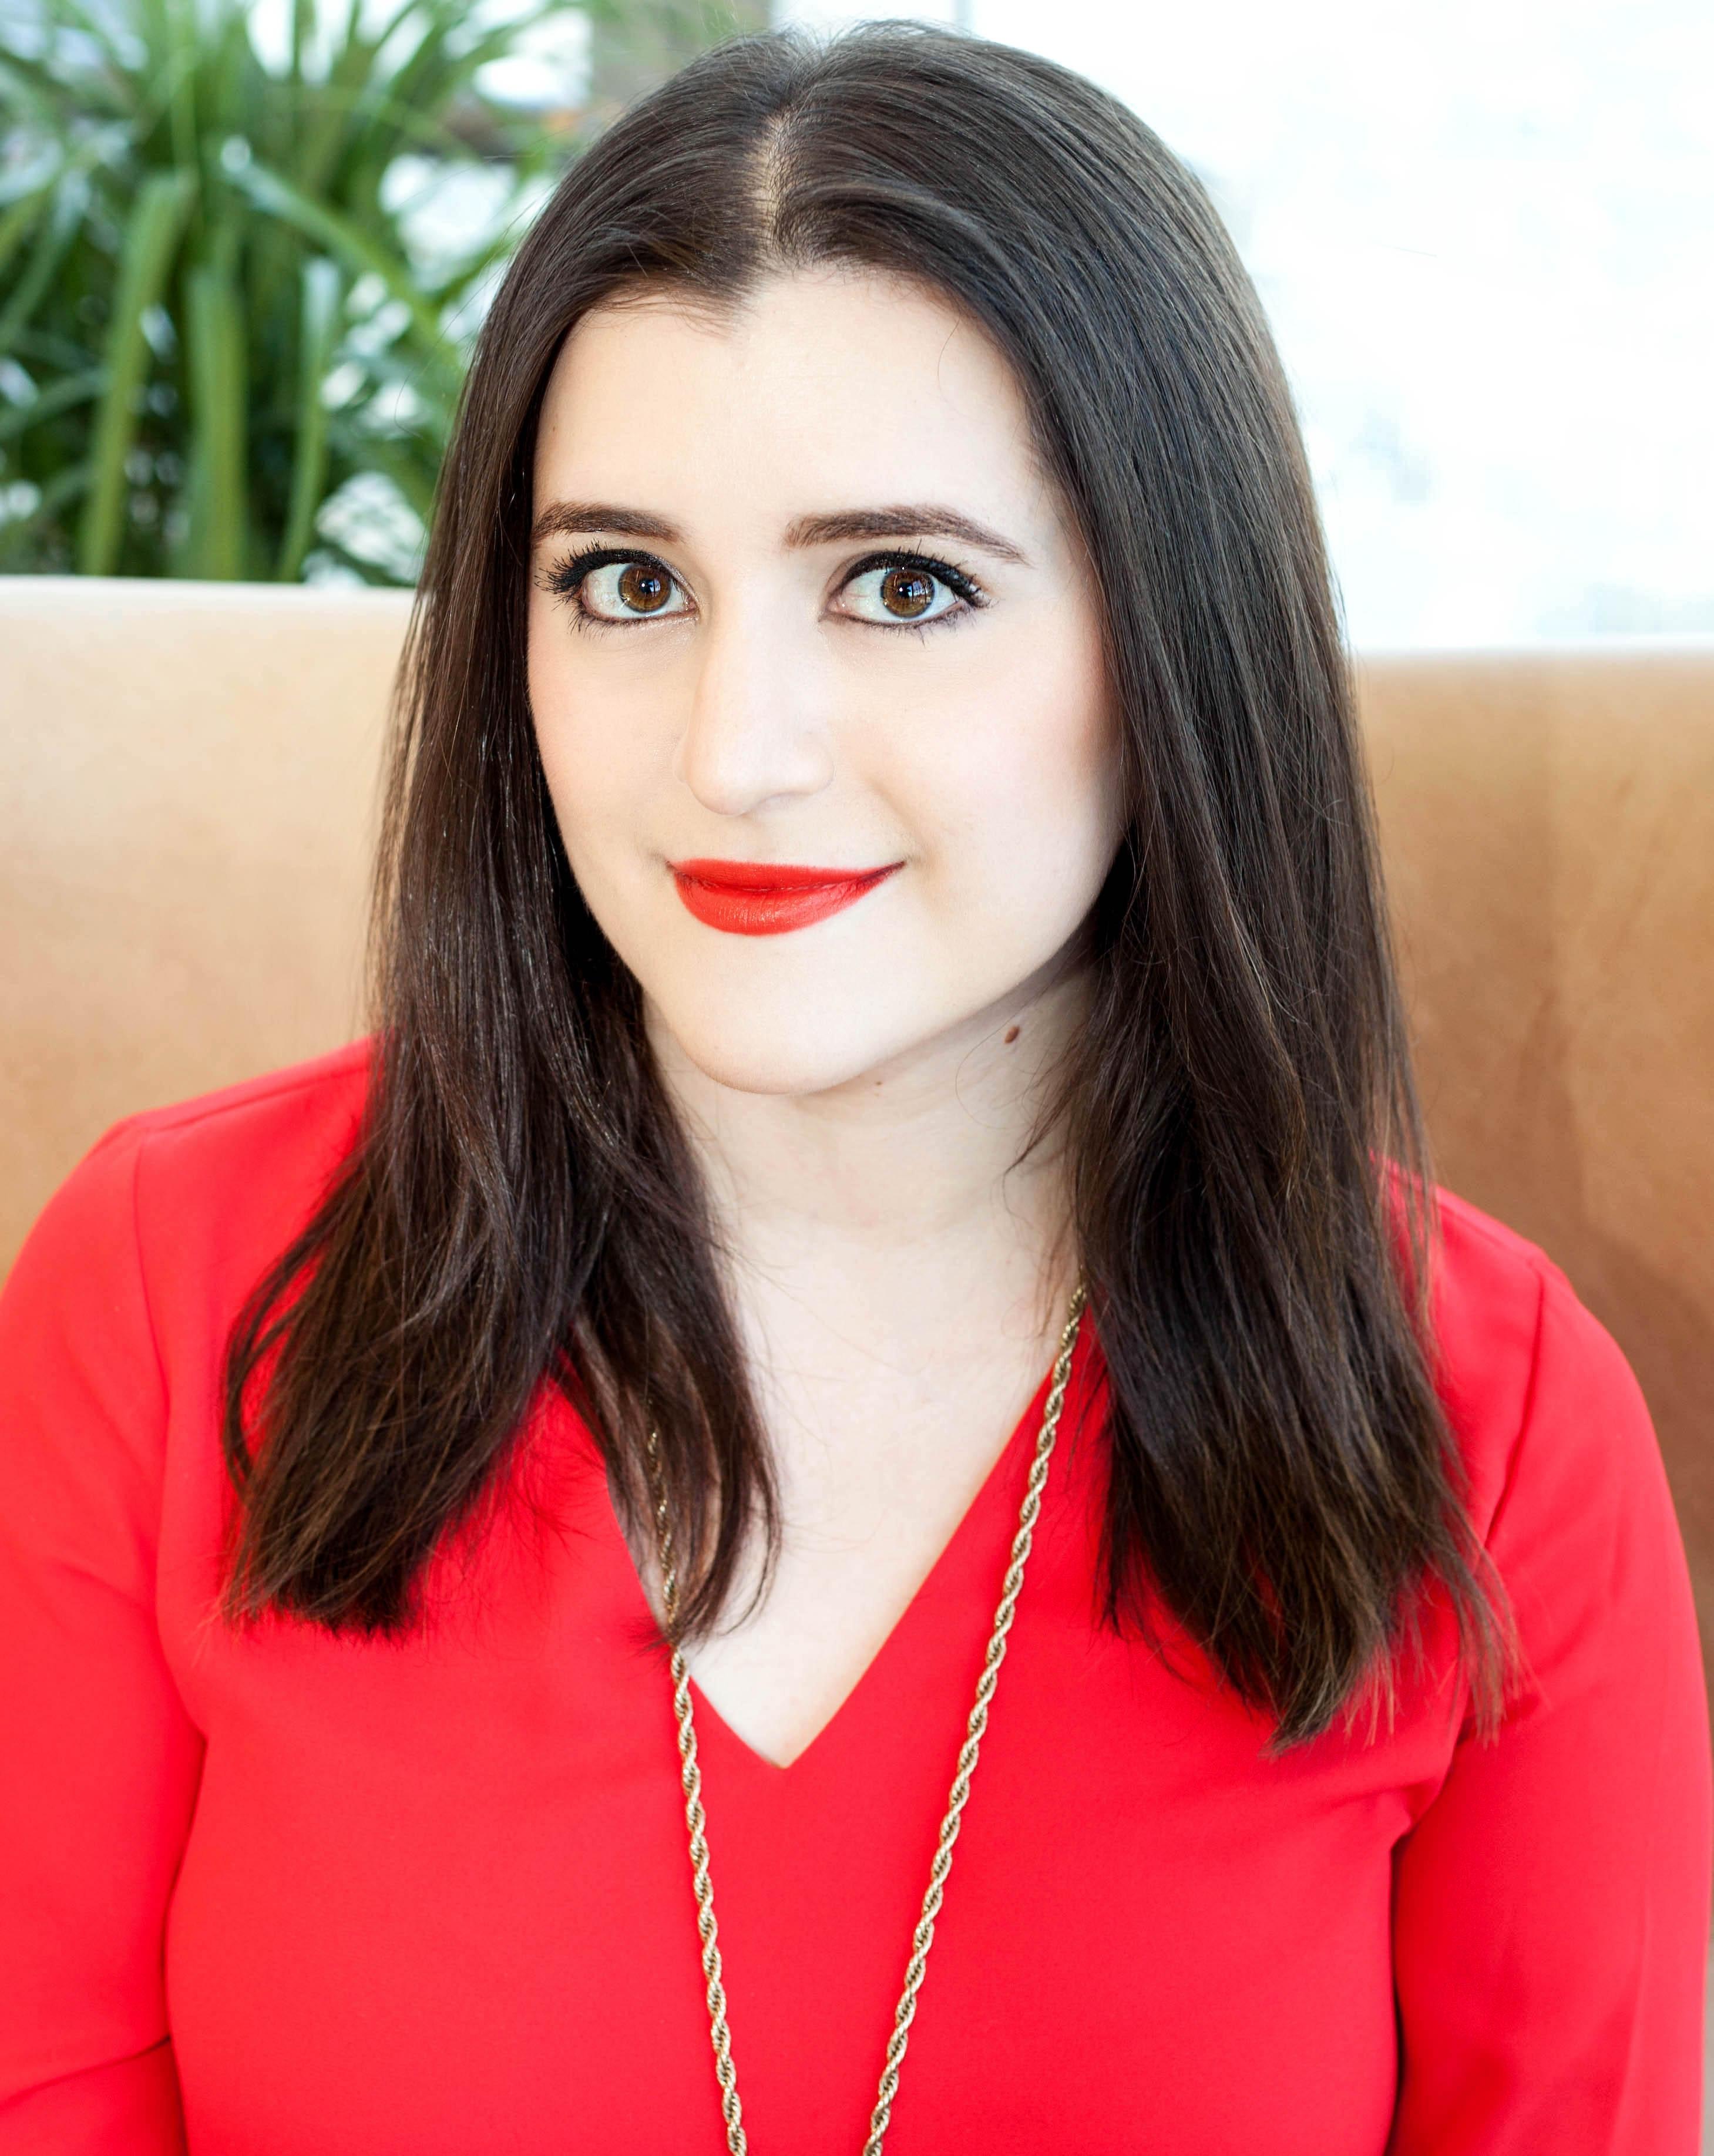 Emily Orofino